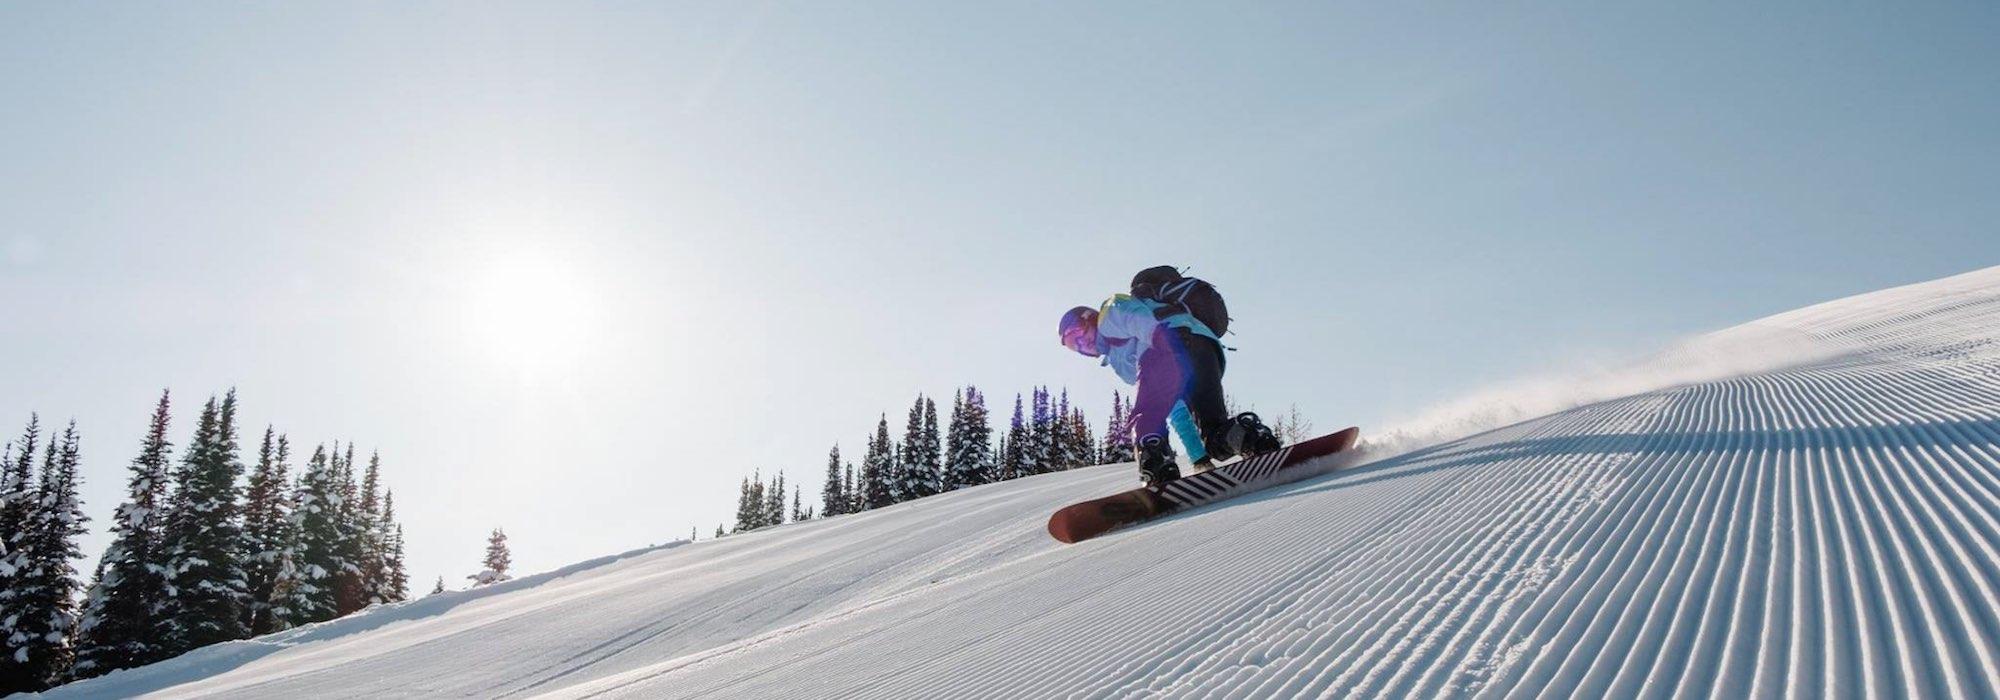 Snowboarder rides a corduroy run at Banff Sunshine Village ski resort, Banff National Park.